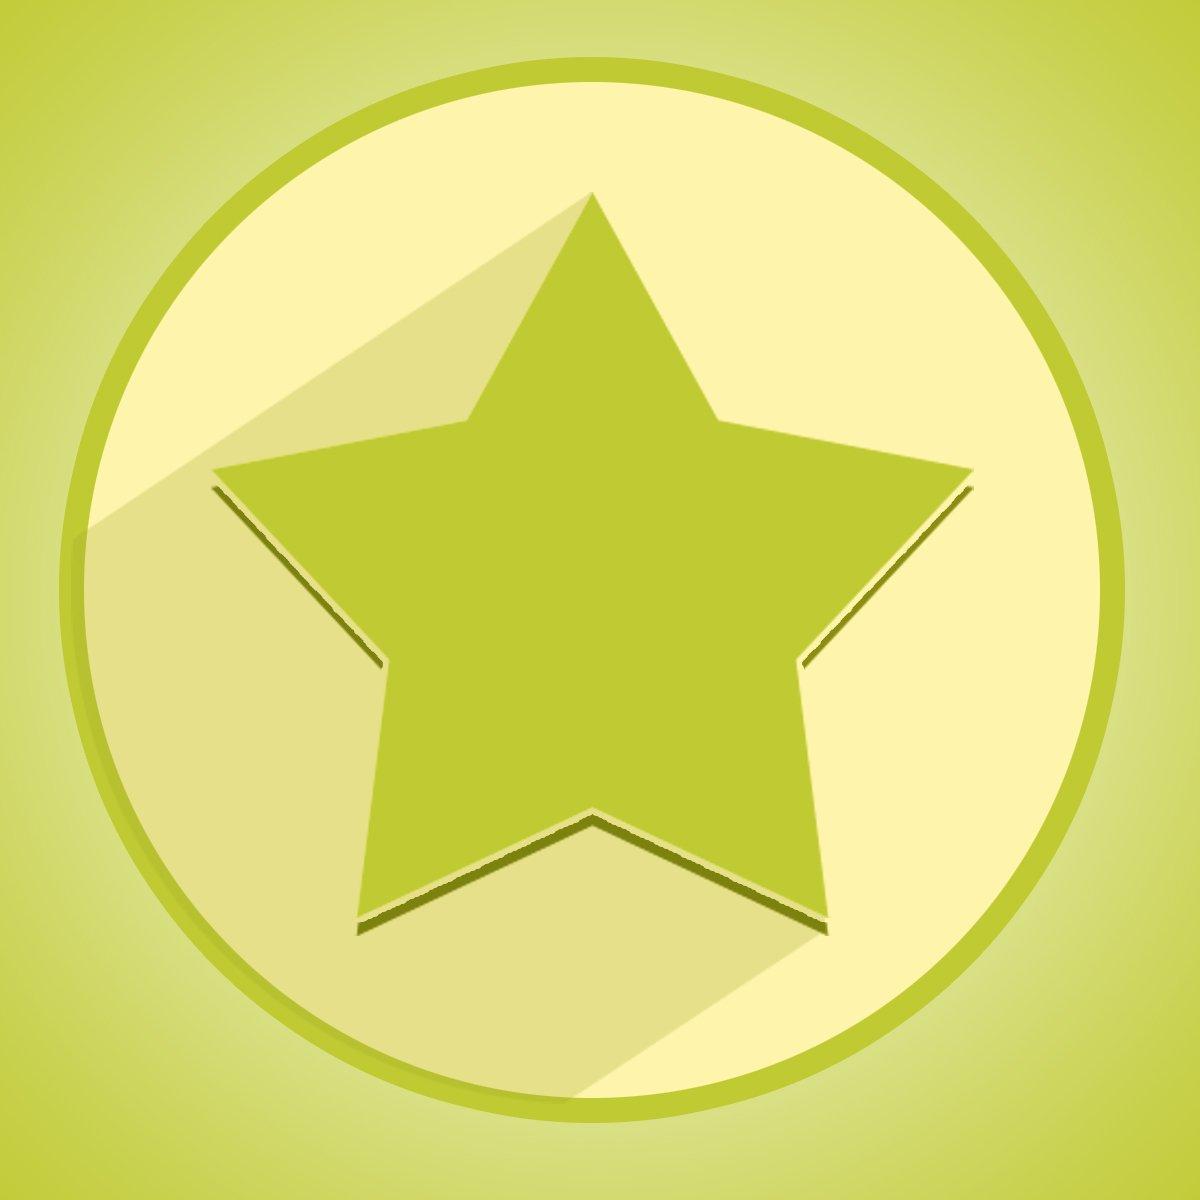 Shopify Review Importer app by Dsmatepro